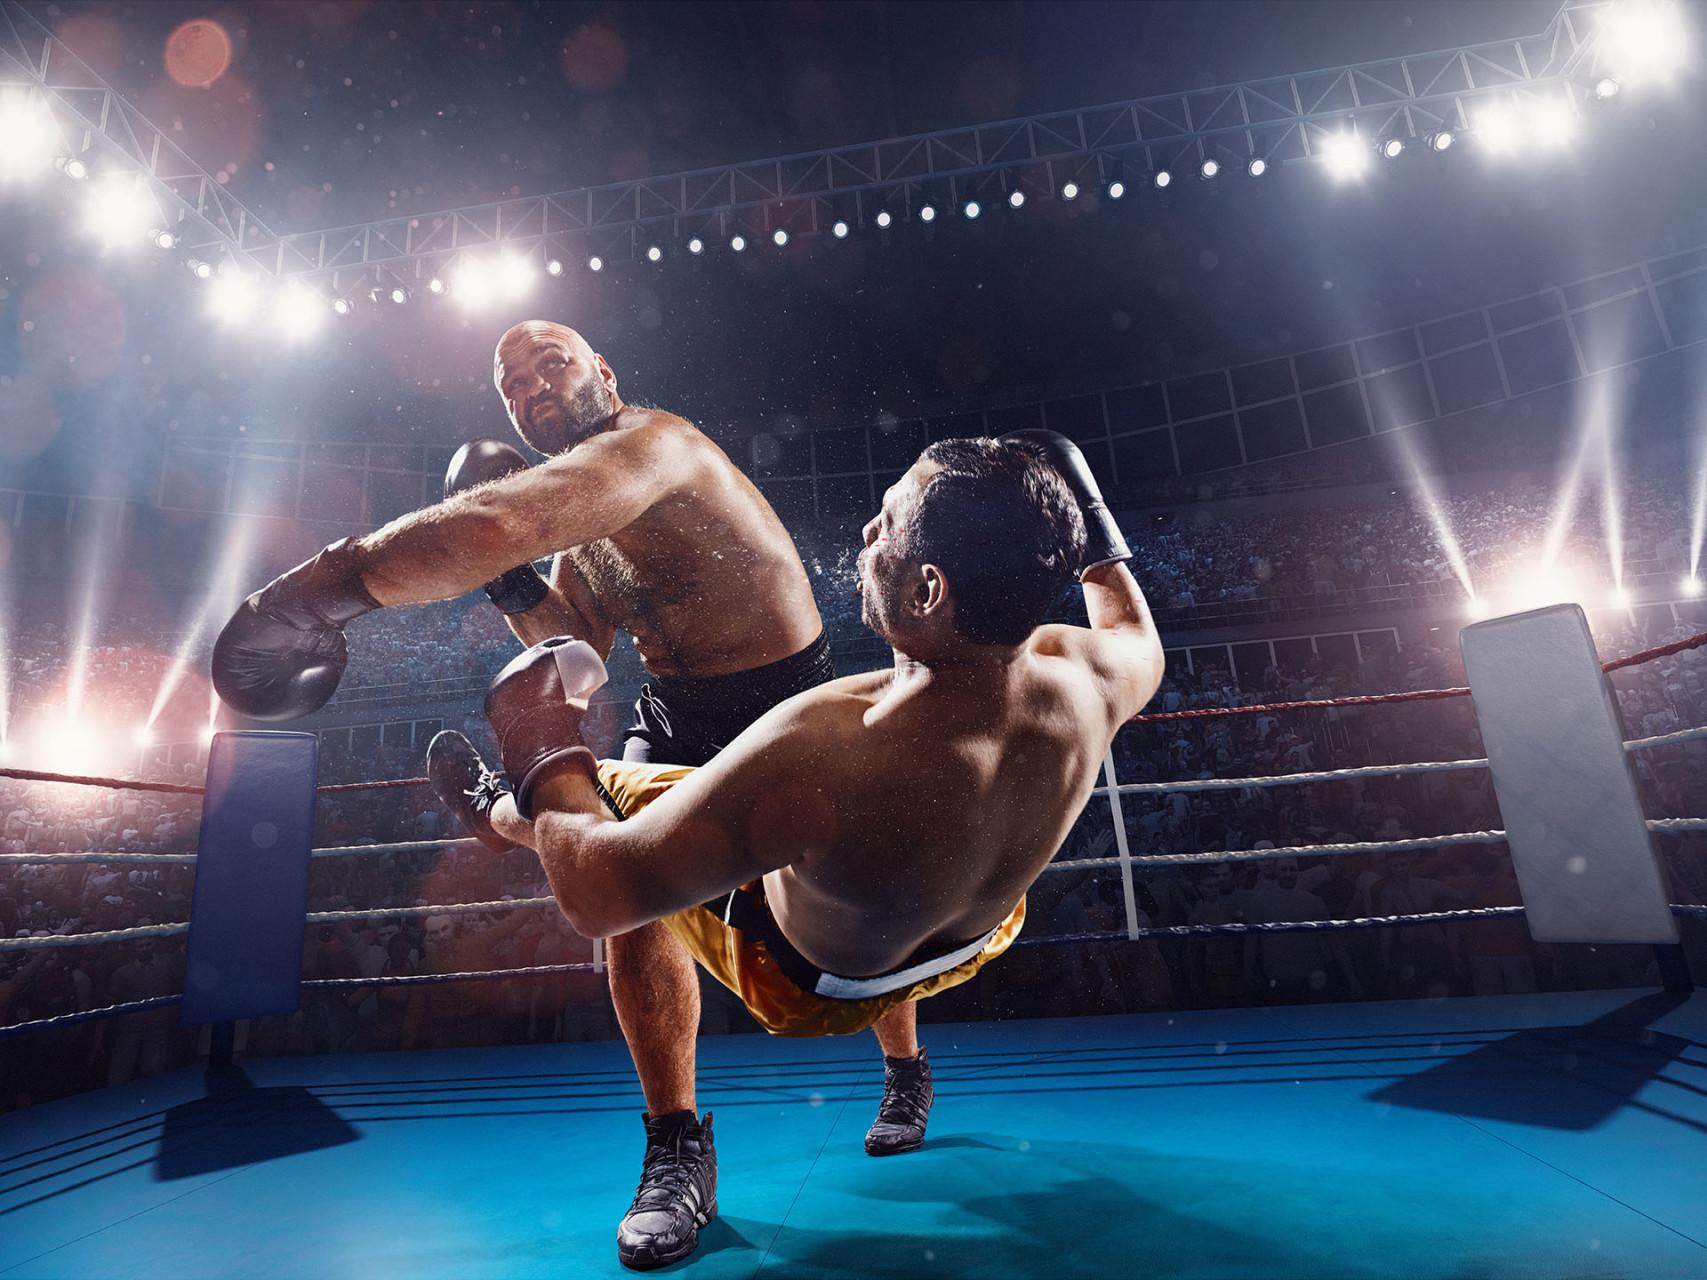 Boxing_2016_10_26_cam7_01-1707x1280